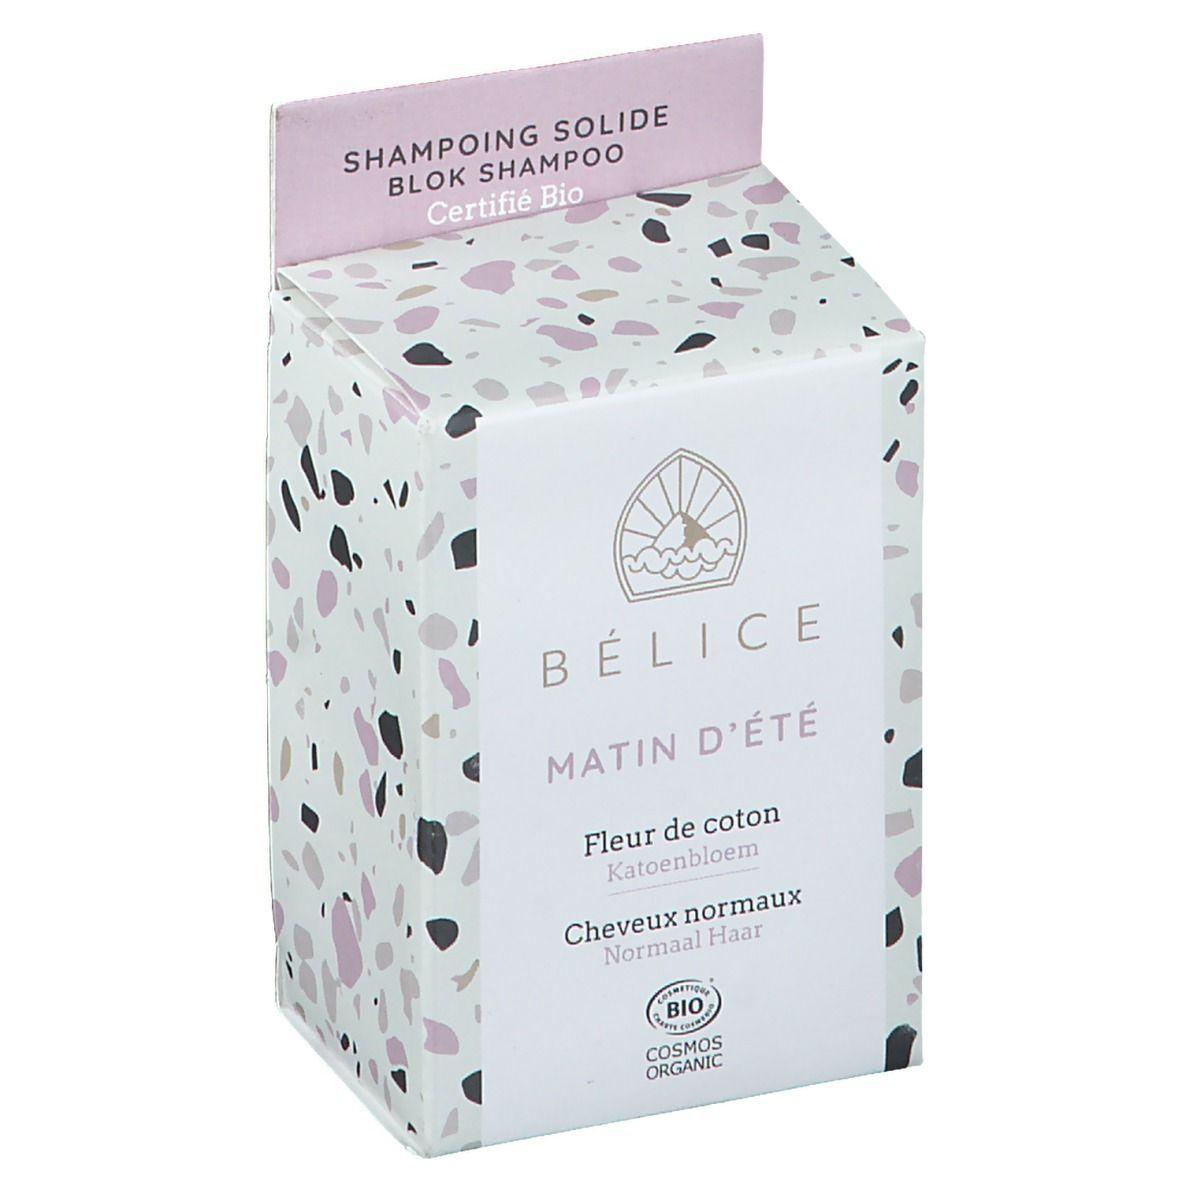 Bélice Shampoing solide Matin d'été Fleur de Coton Bio g shampooing